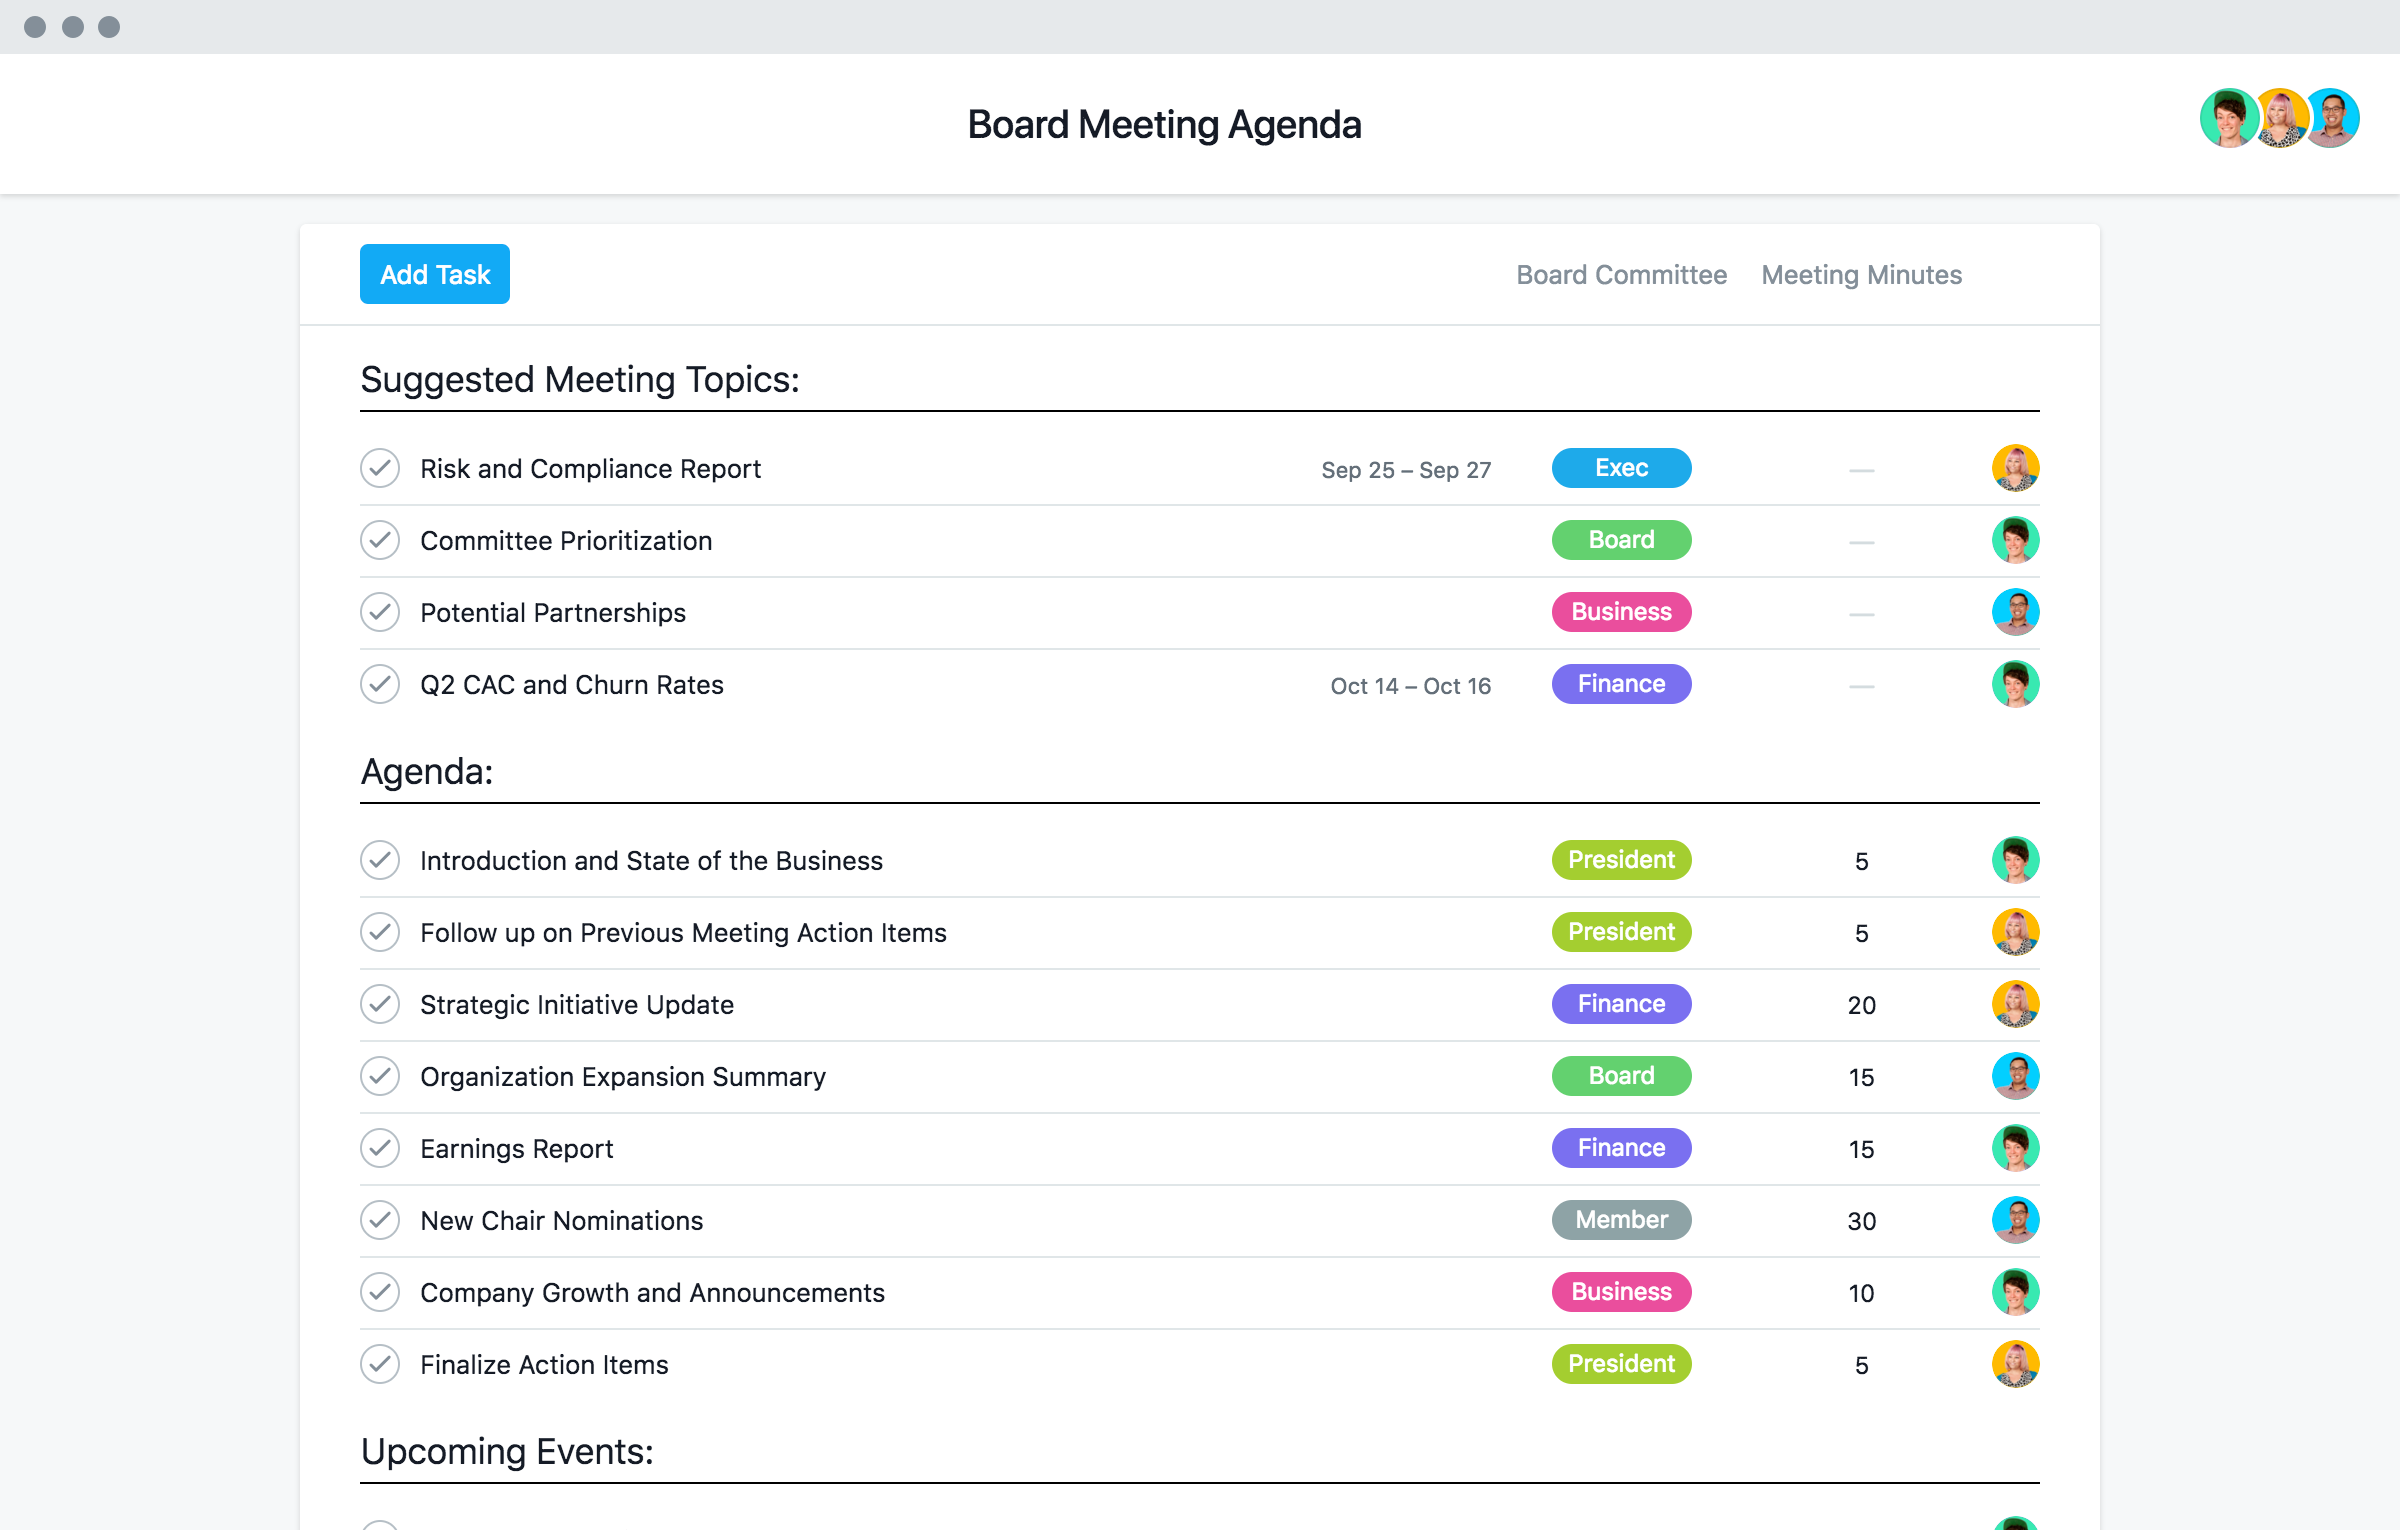 Board Meeting Agenda Template Corporate Meeting Minutes Asana